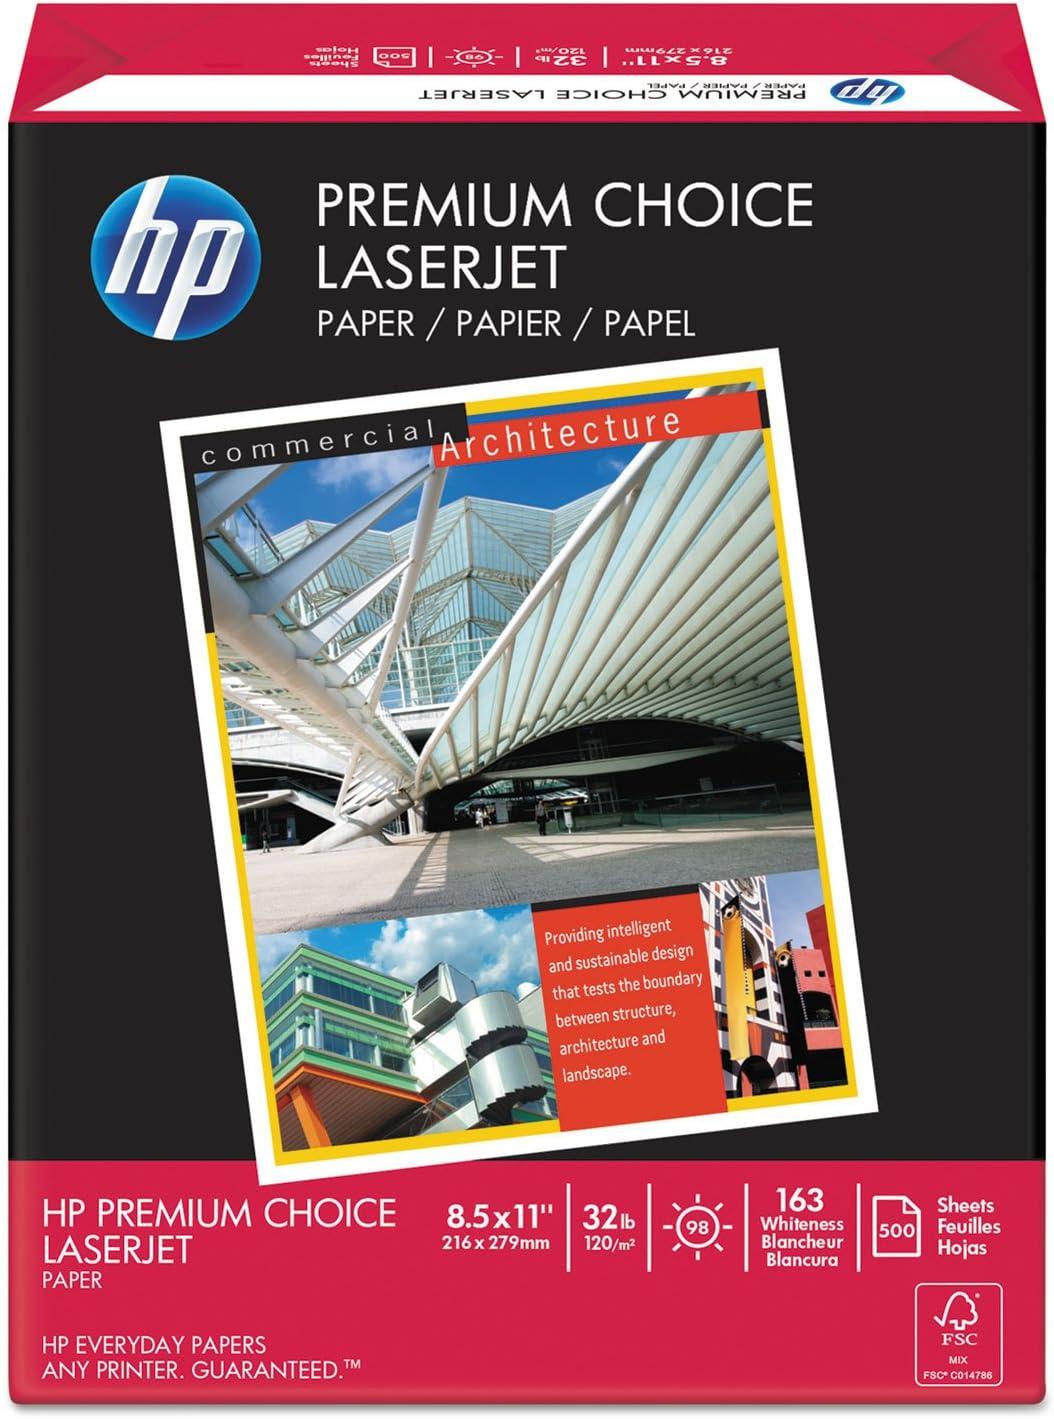 HP 113100 Premium Choice LaserJet Paper, 98 Brightness, 32lb, 8-1/2x11, White, 500 Shts/Rm